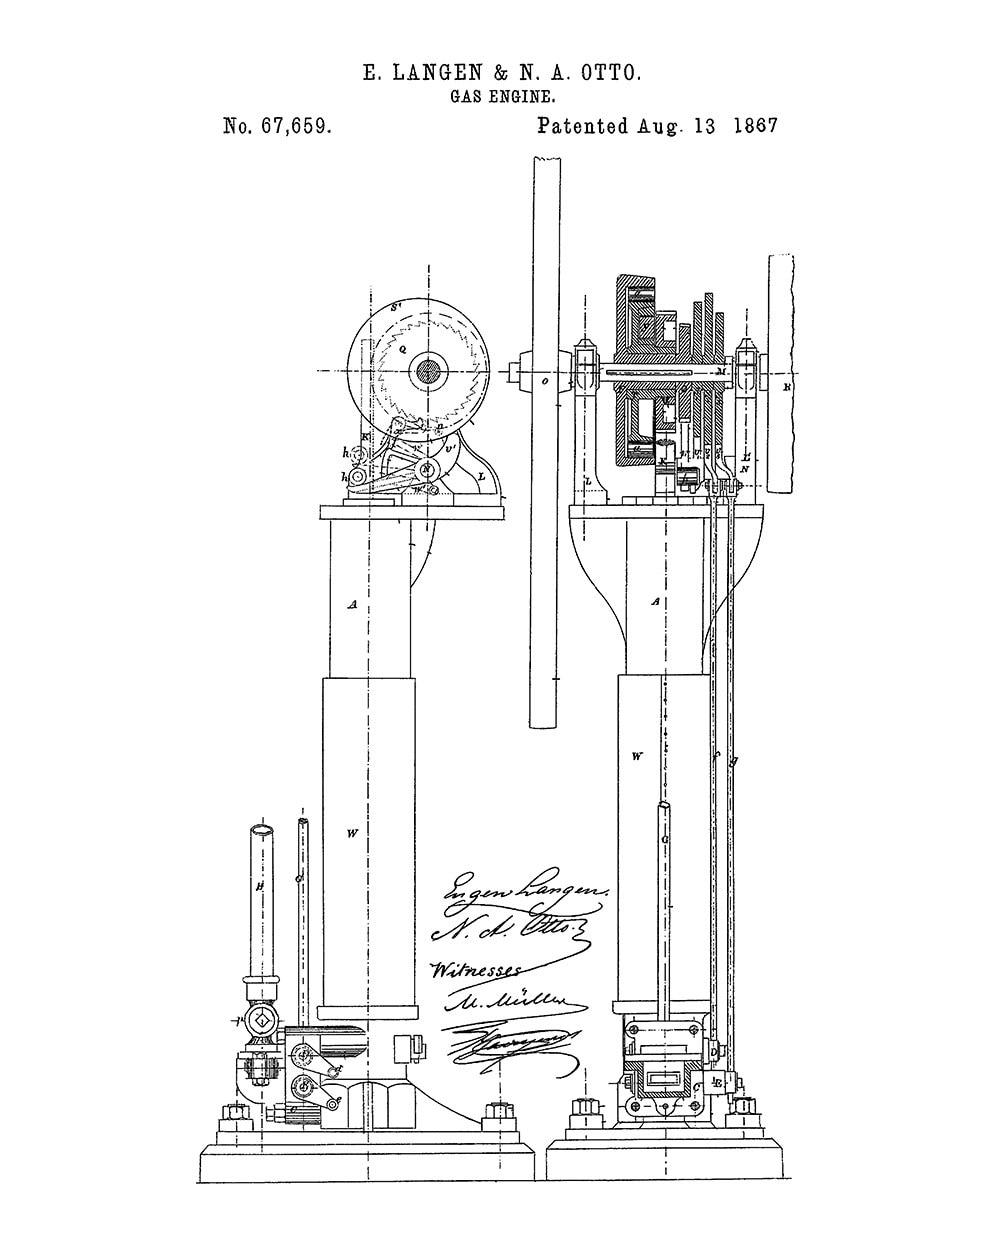 langen otto improvements in air engines patent art print. Black Bedroom Furniture Sets. Home Design Ideas